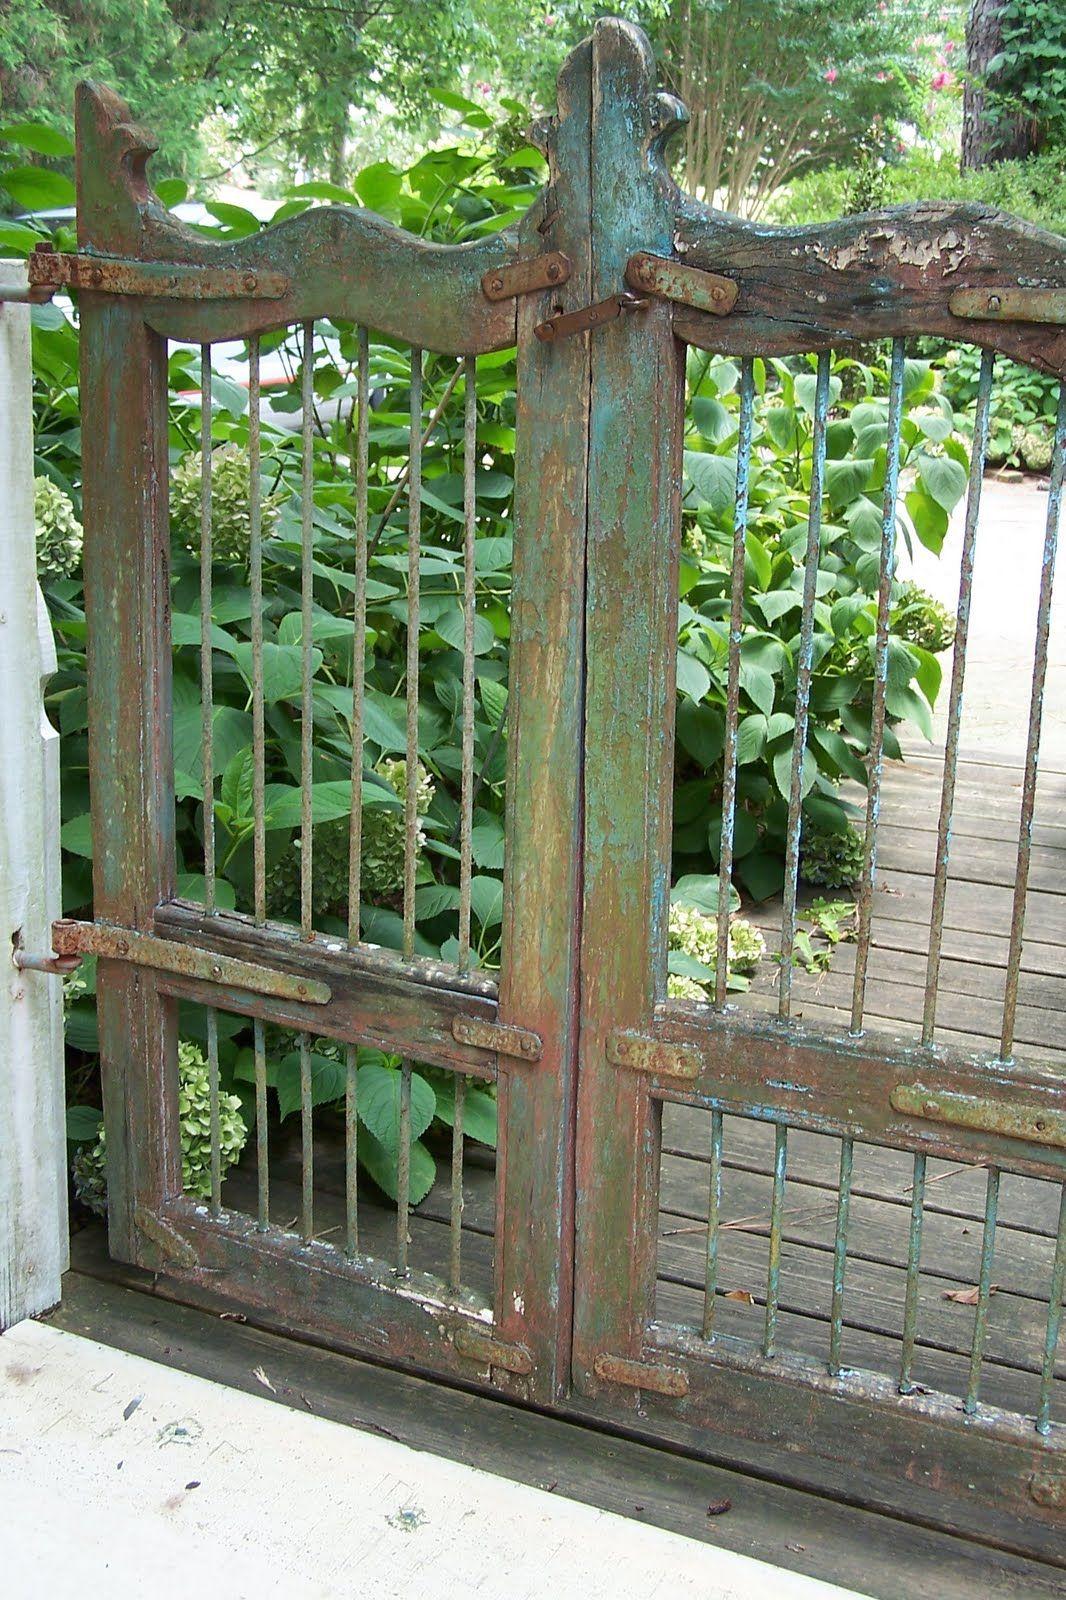 Rustic + functional = absolutely wonderful | Garden ...